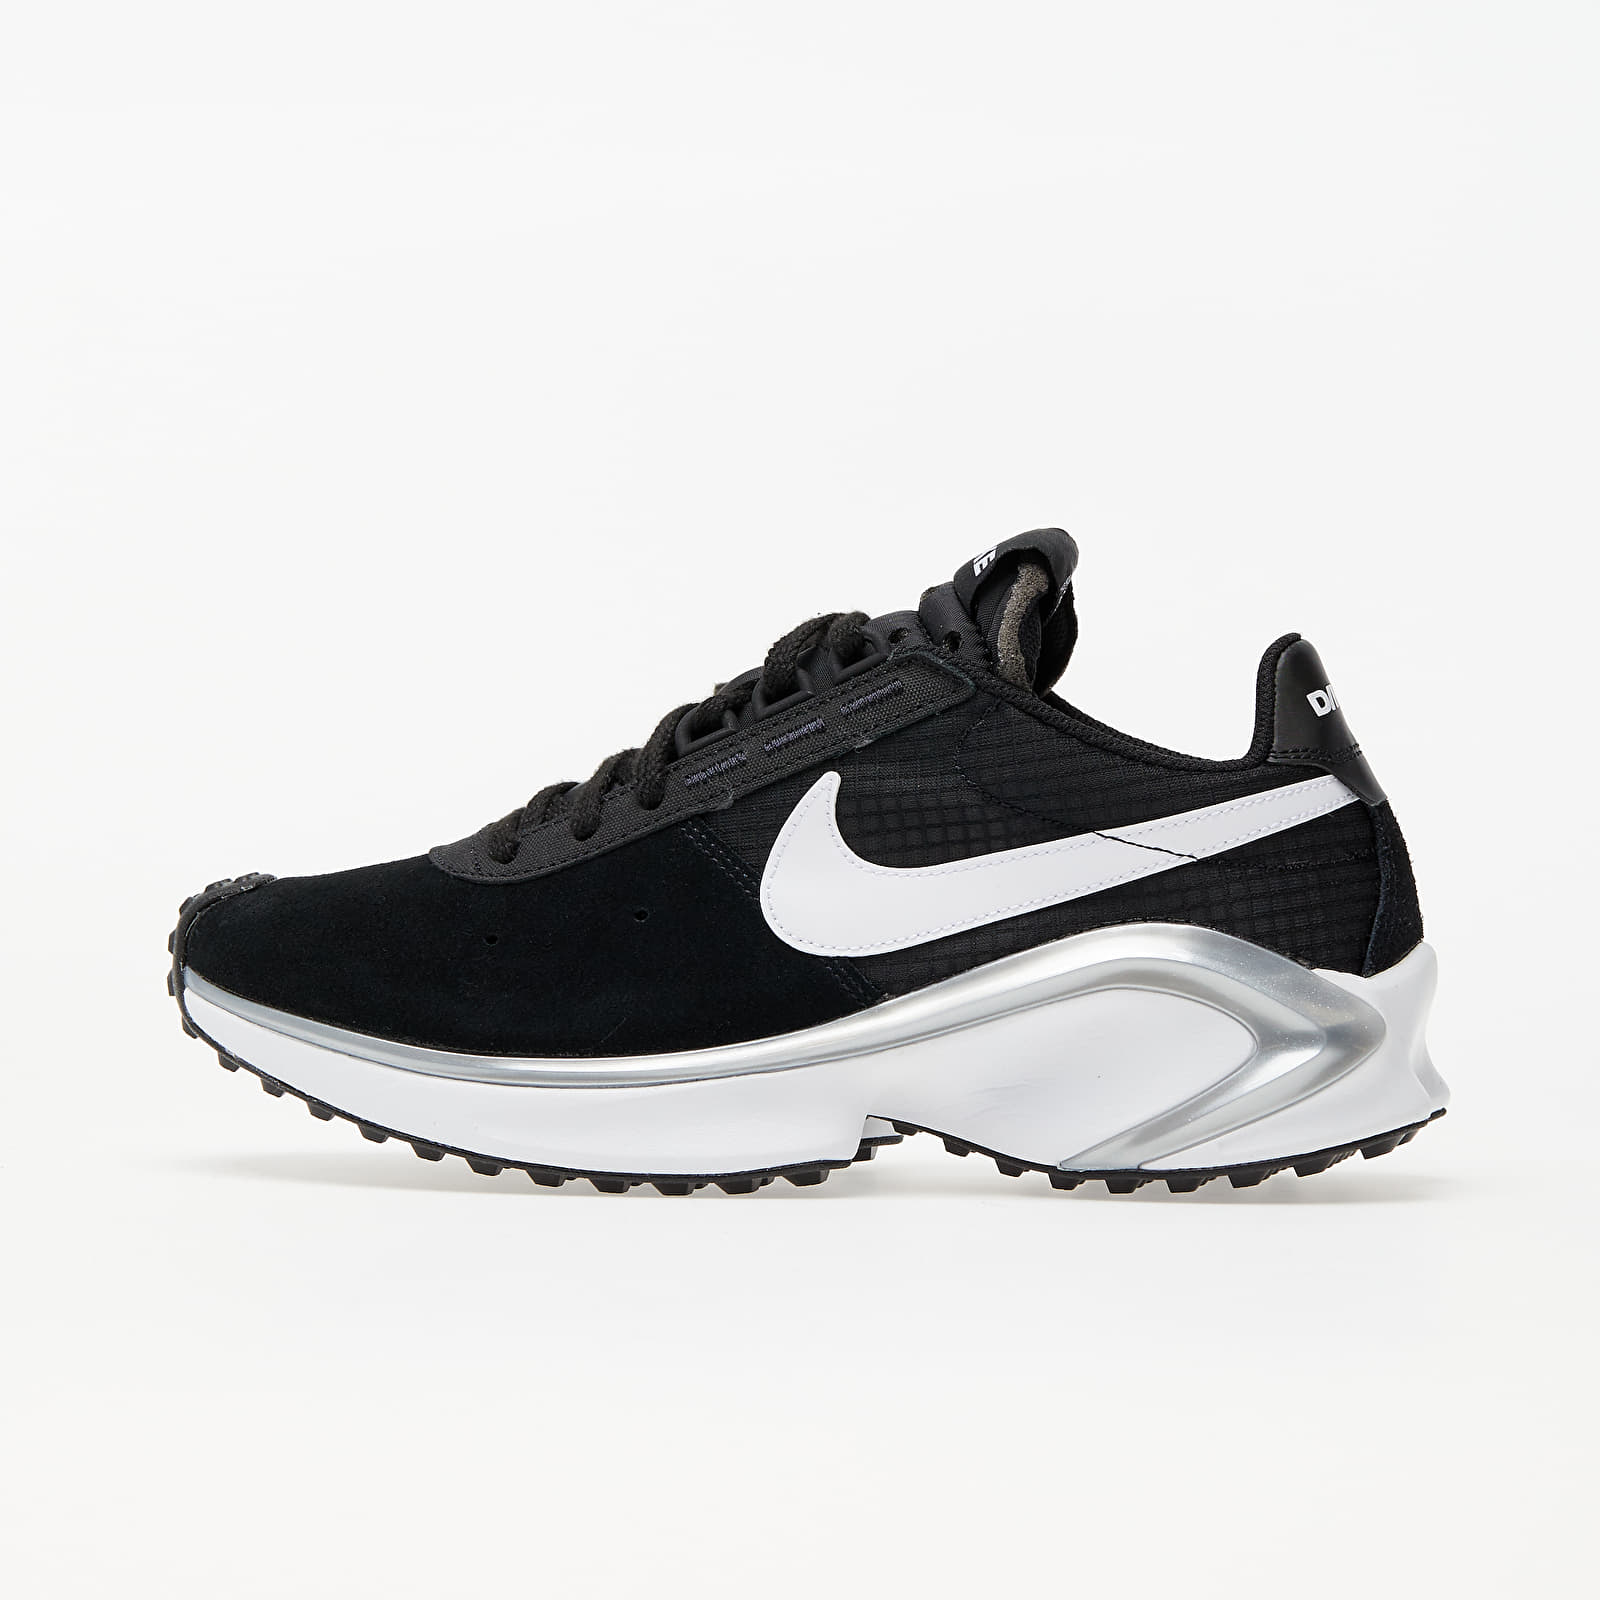 Nike D/MS/X Waffle Black/ White-Metallic Silver-White CQ0205-001